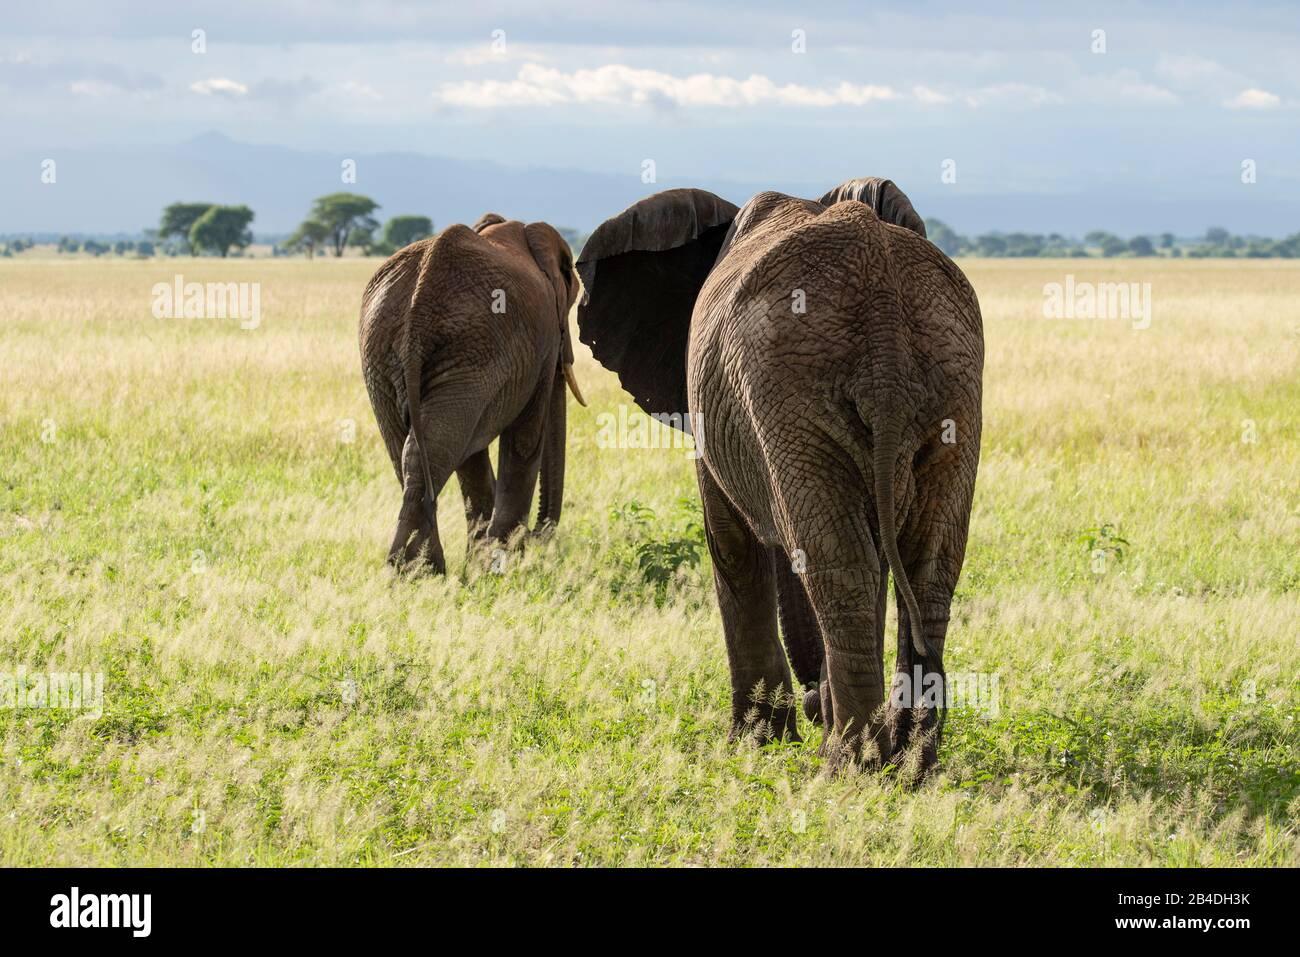 Tanzania, Northern Tanzania, Serengeti National Park, Ngorongoro Crater, Tarangire, Arusha and Lake Manyara, two african elephants in the savanna, loxodonta africana Stock Photo